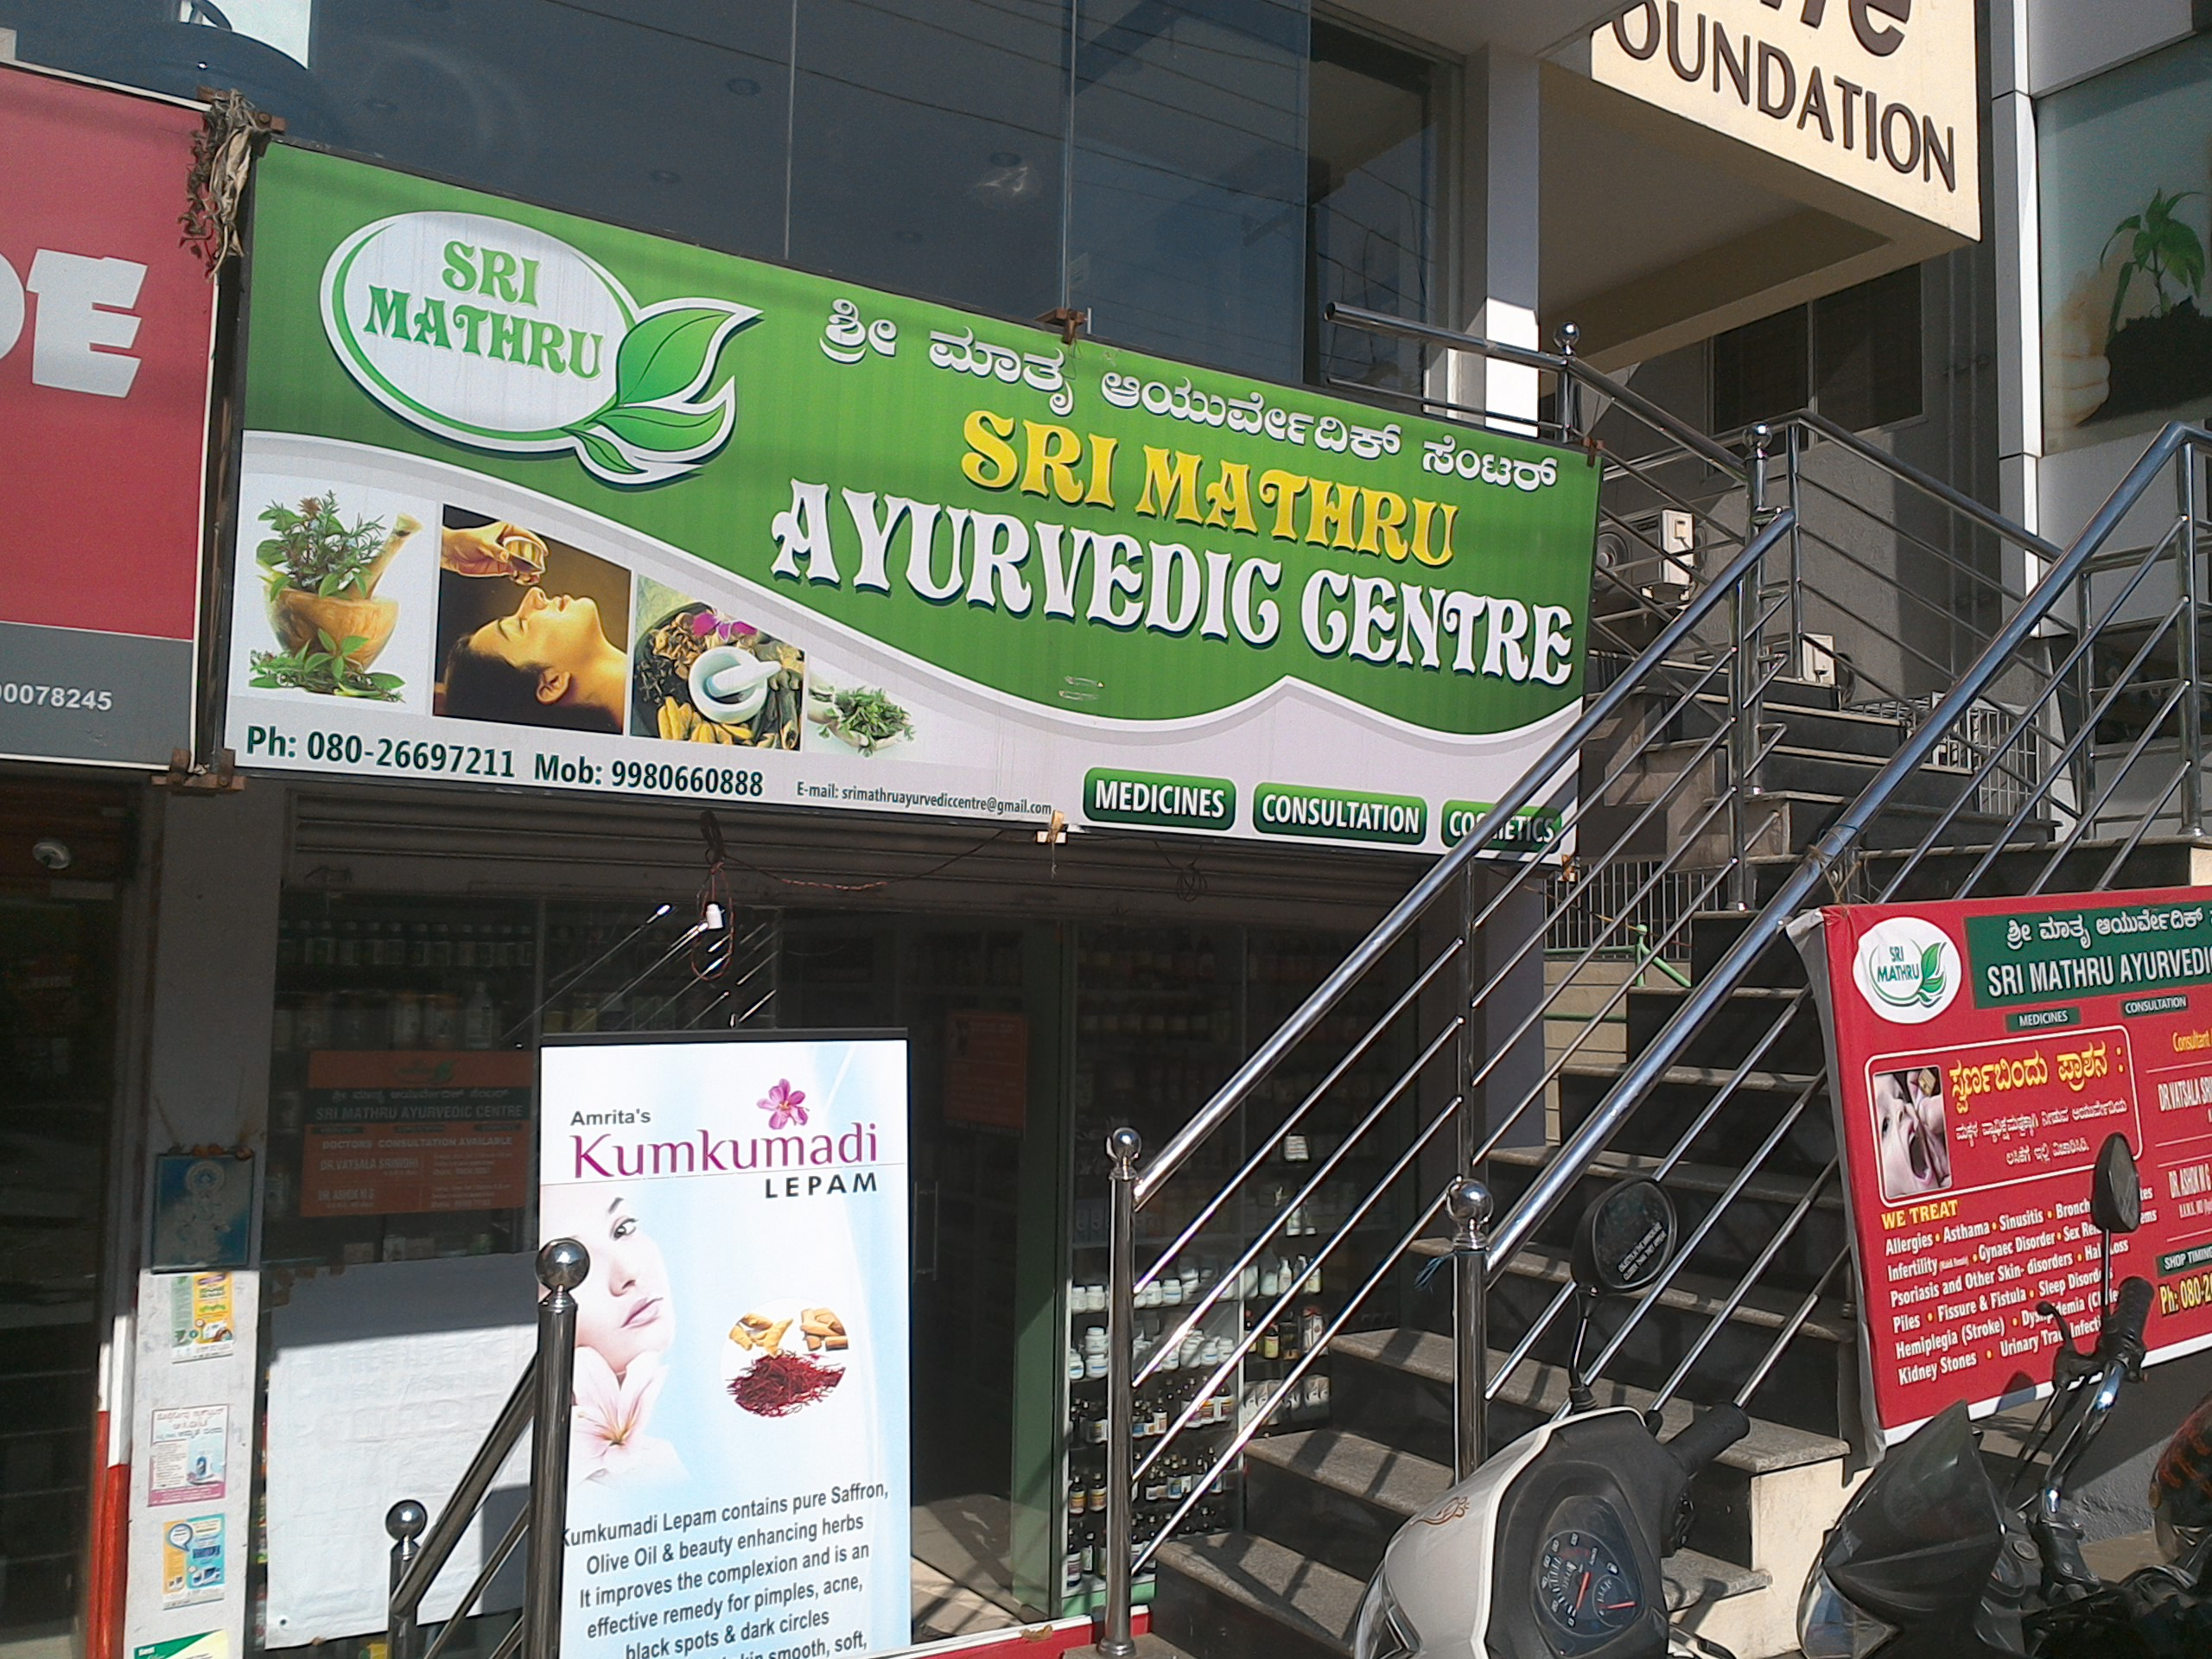 Sri Mathru Ayurvedic Centre